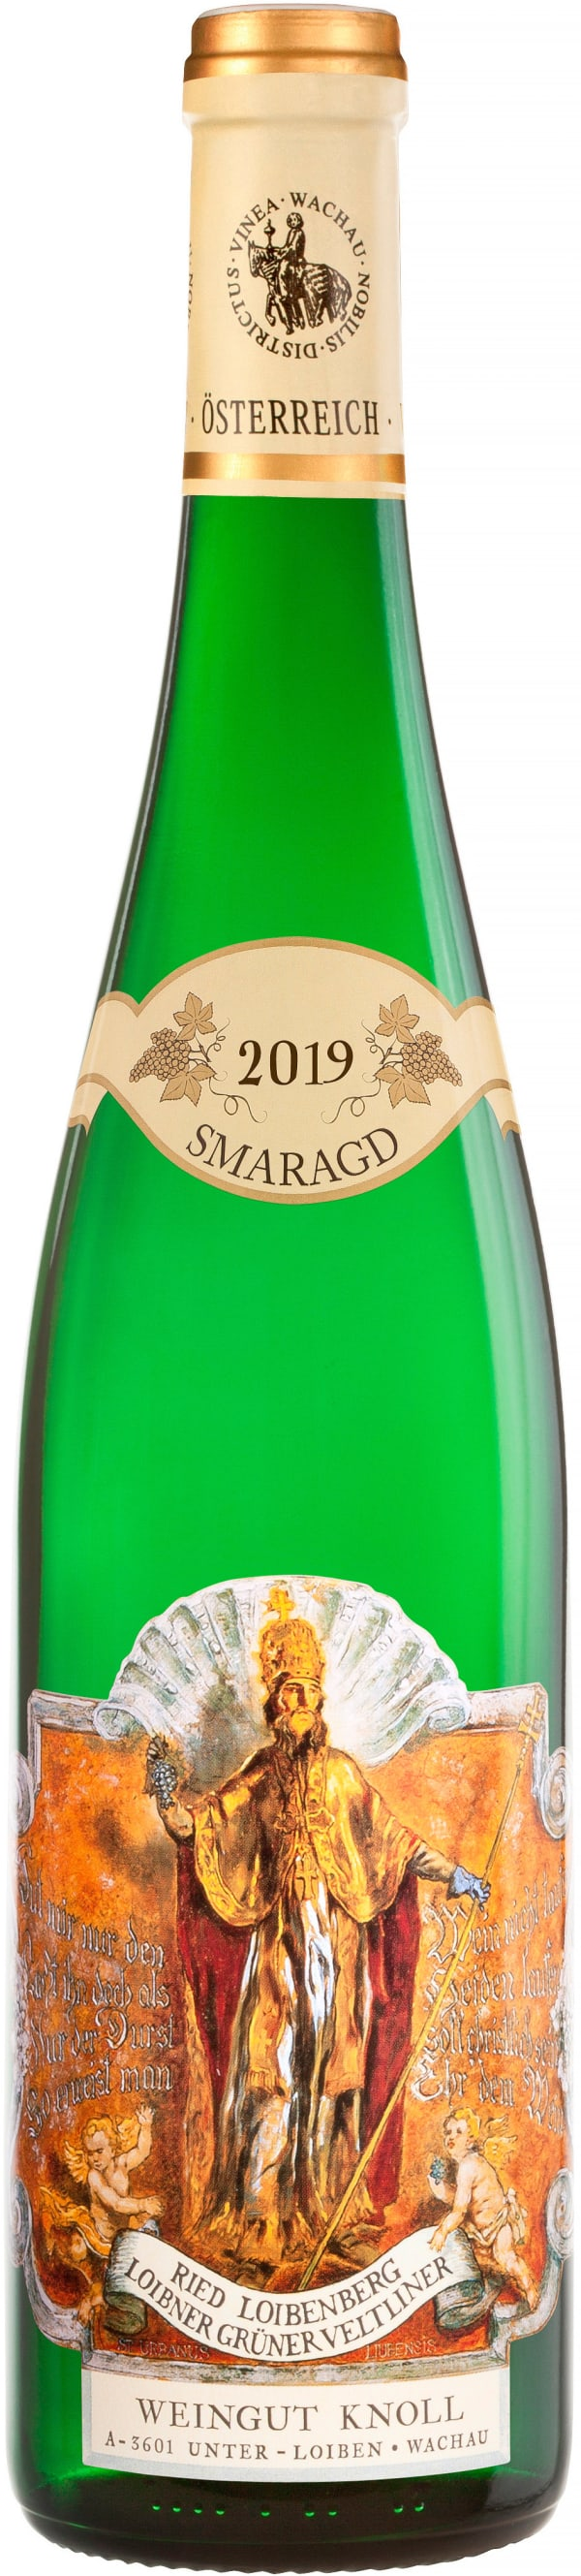 Knoll Loibenberg Grüner Veltliner Smaragd 2019